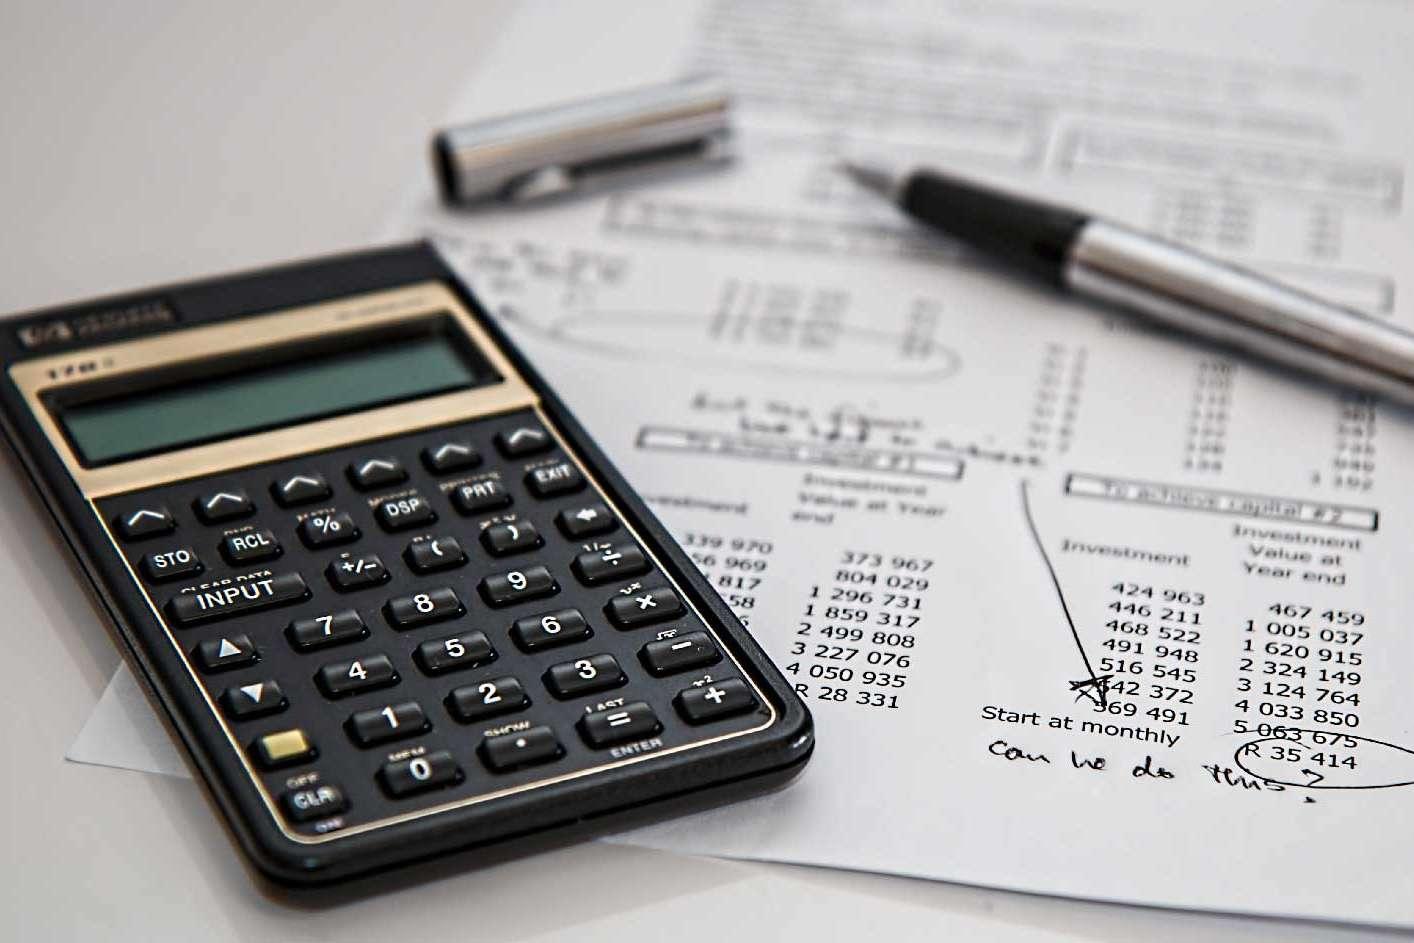 analyse financière outil